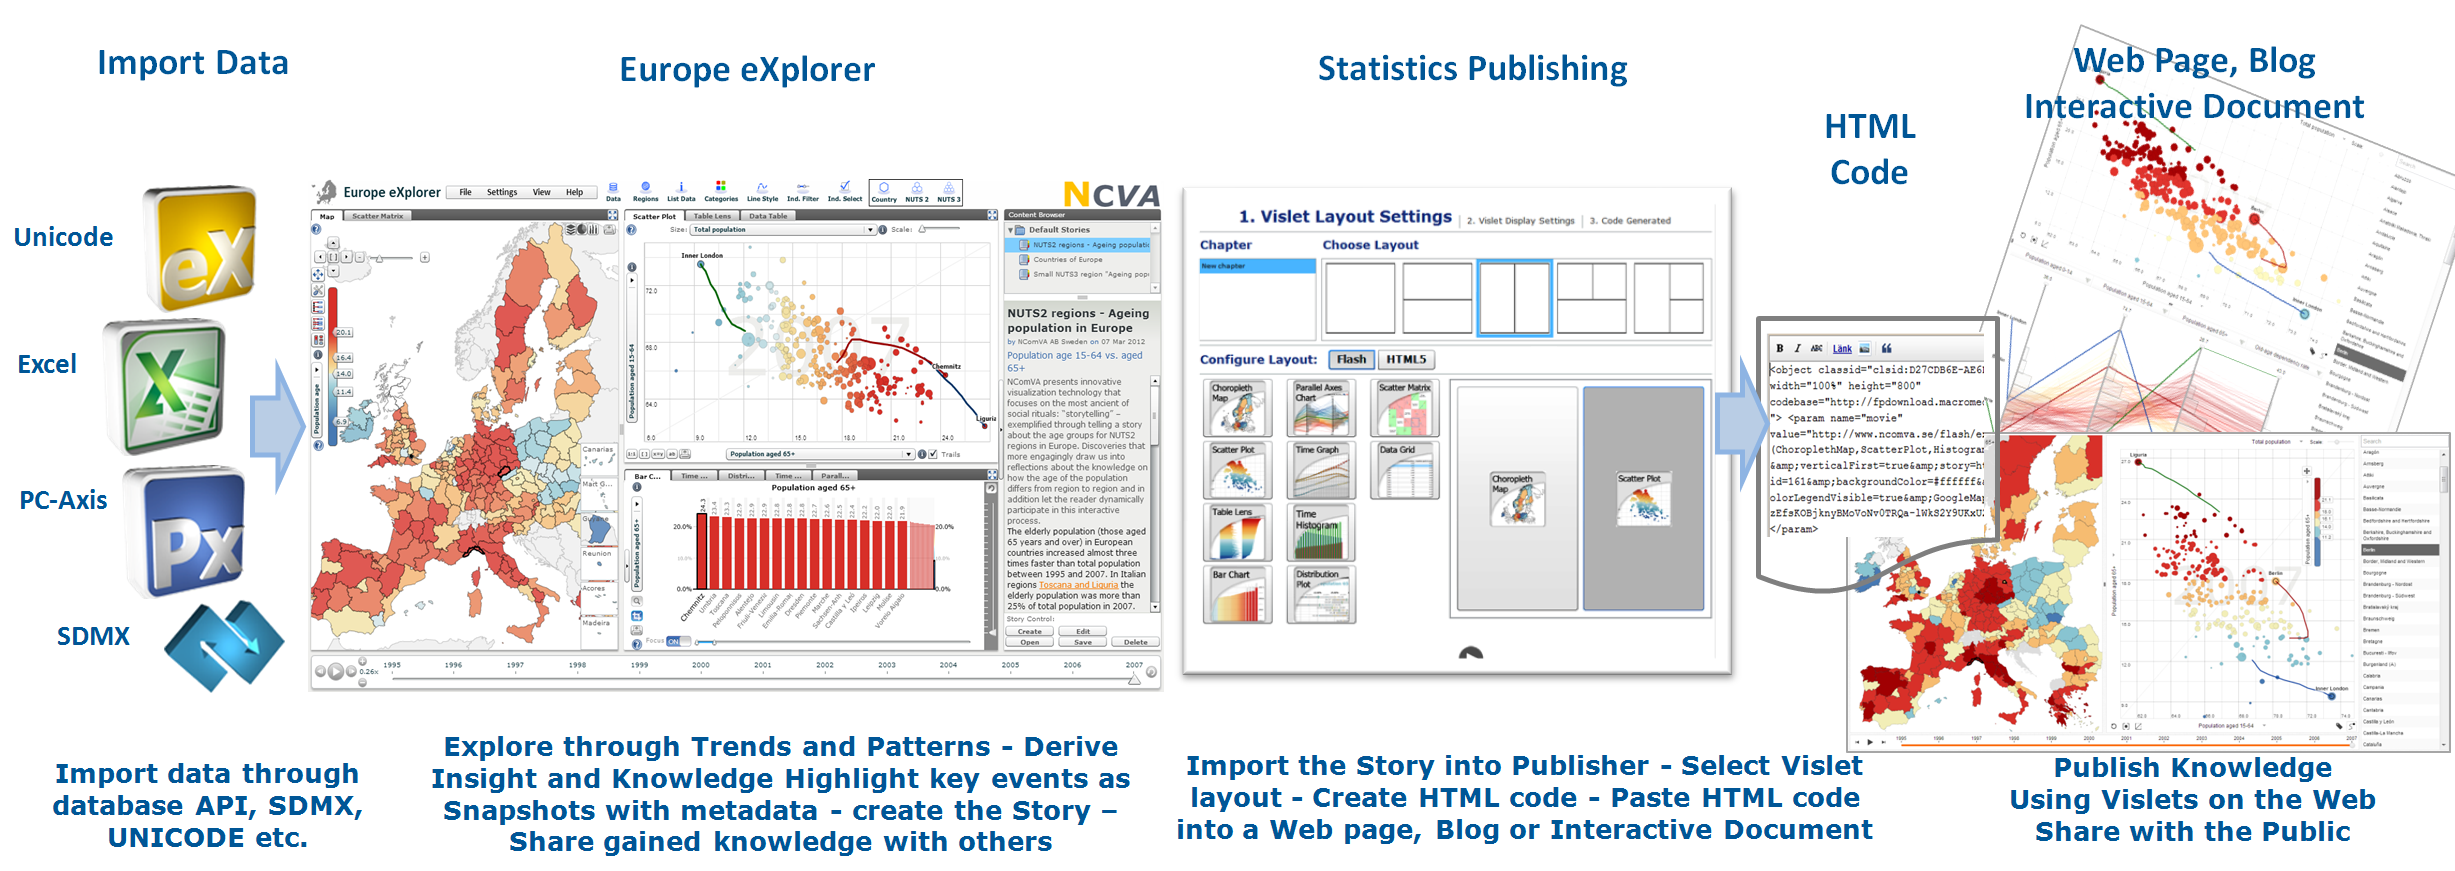 Europe eXplorer publish